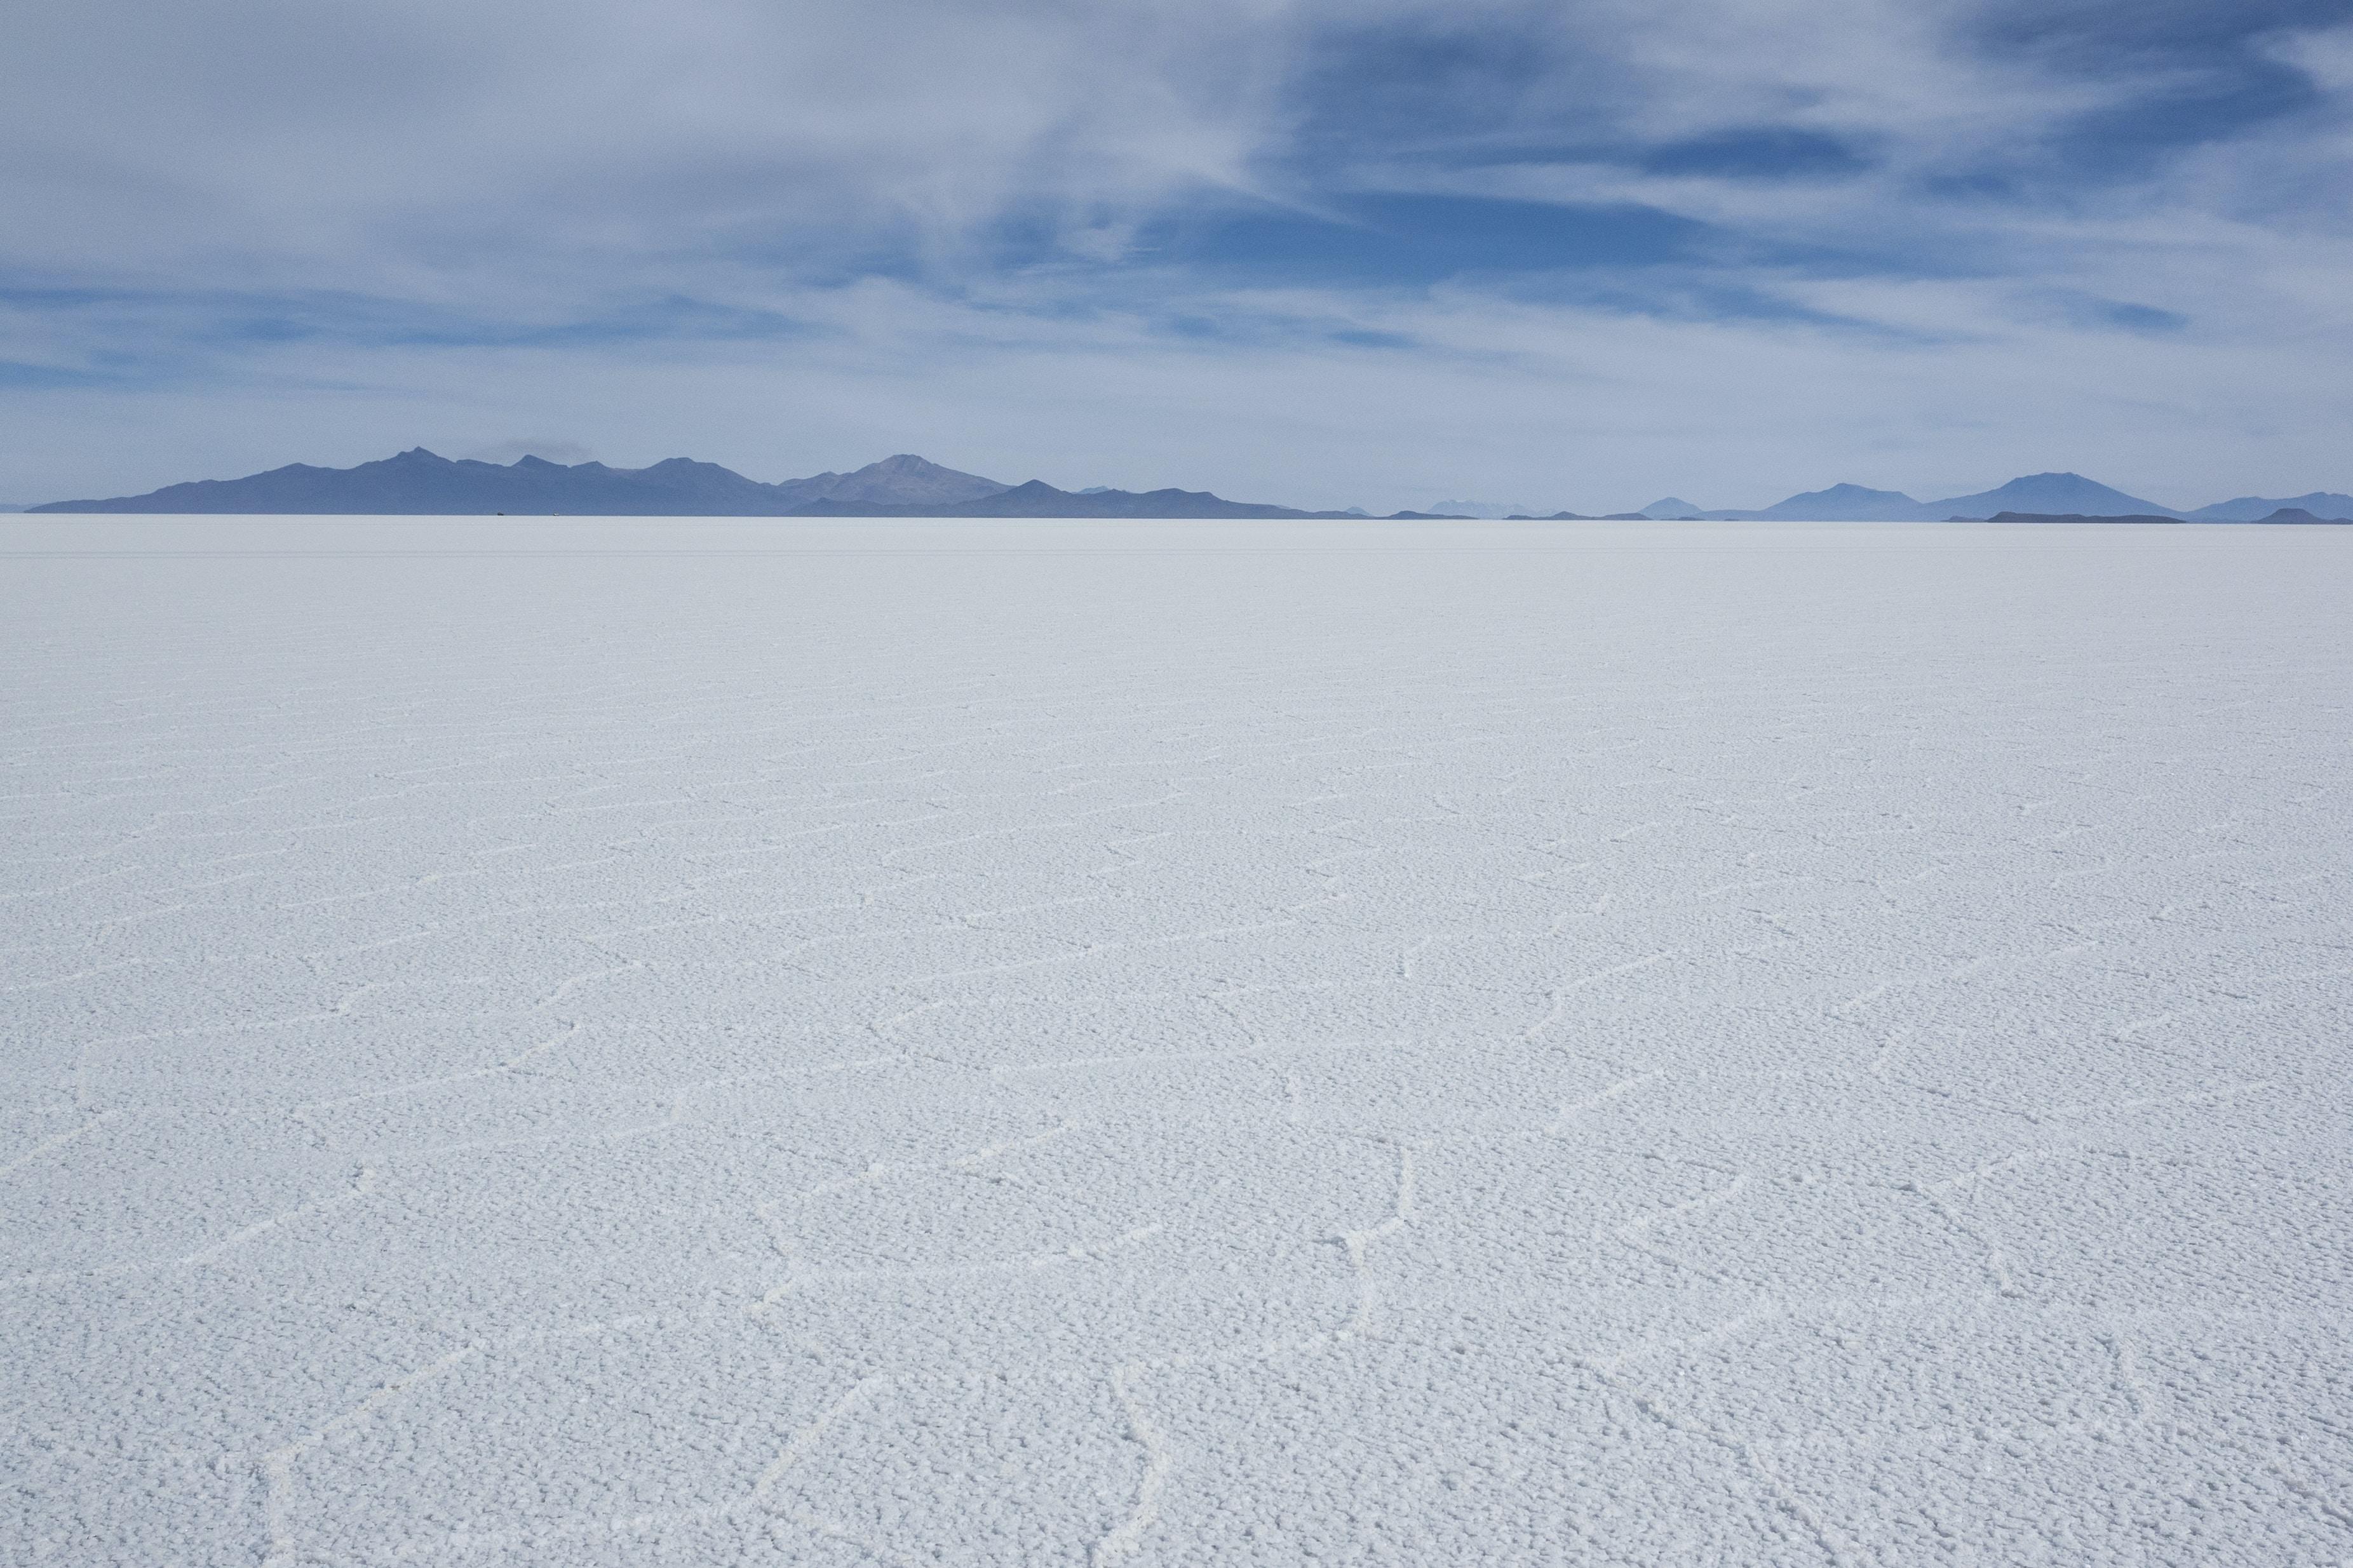 white snow field under white clouds at daytime